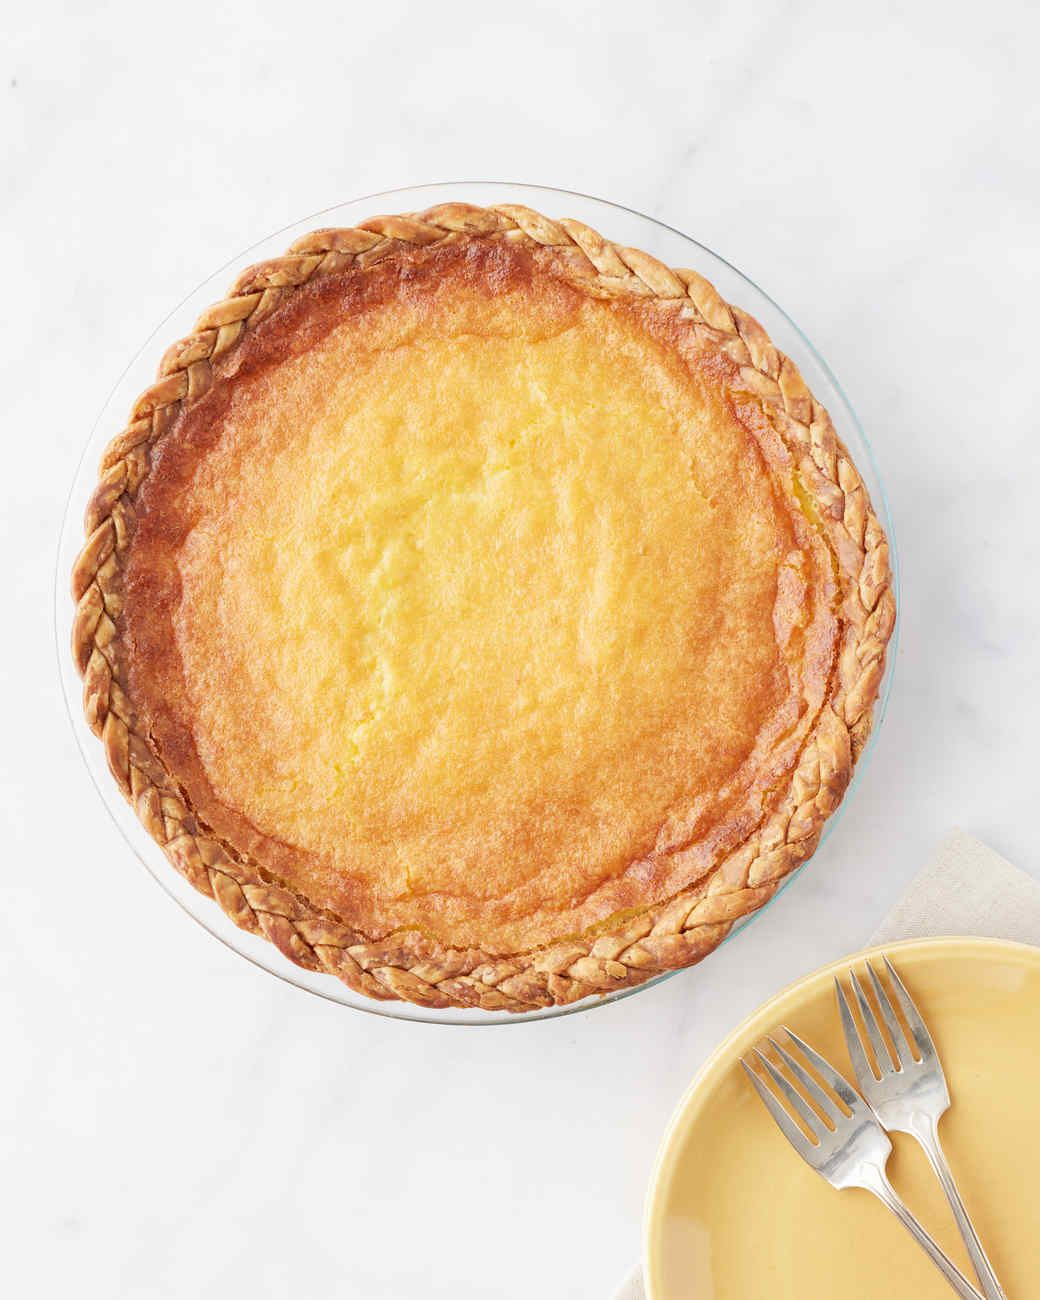 Martha S Buttermilk Pie Recipe Recipe Desserts Buttermilk Pie Recipe Buttermilk Pie